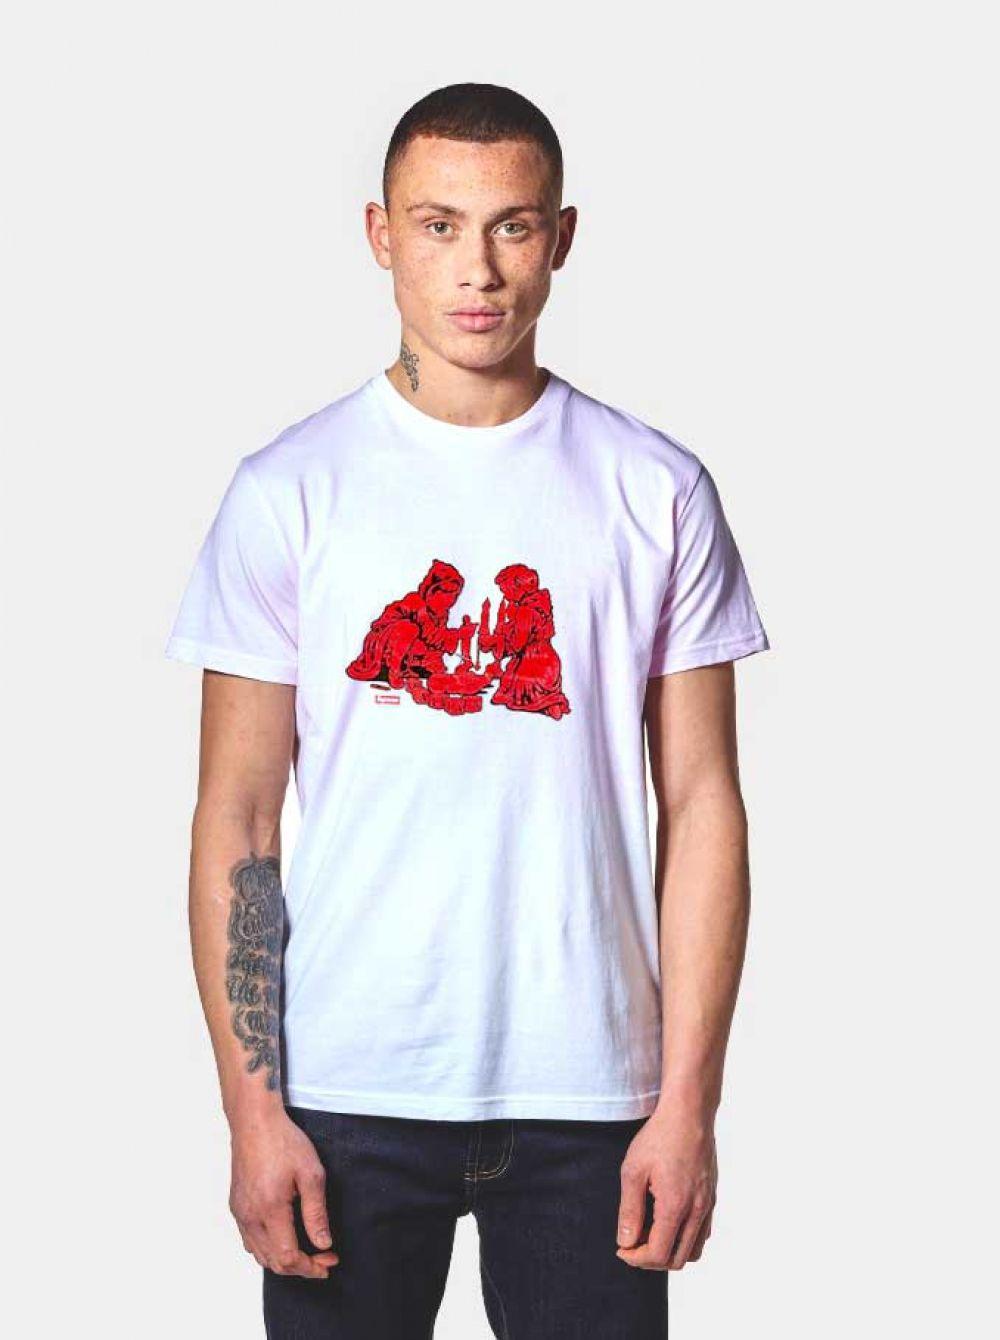 fbc125b0a376 Supreme Sean Cliver Sacrifice T Shirt #Tee #Hype #Outfits #Outfit  #Hypebeast #fashion #shirt #Tees #Tops #Teen #outfitideas #summergift  #Summer